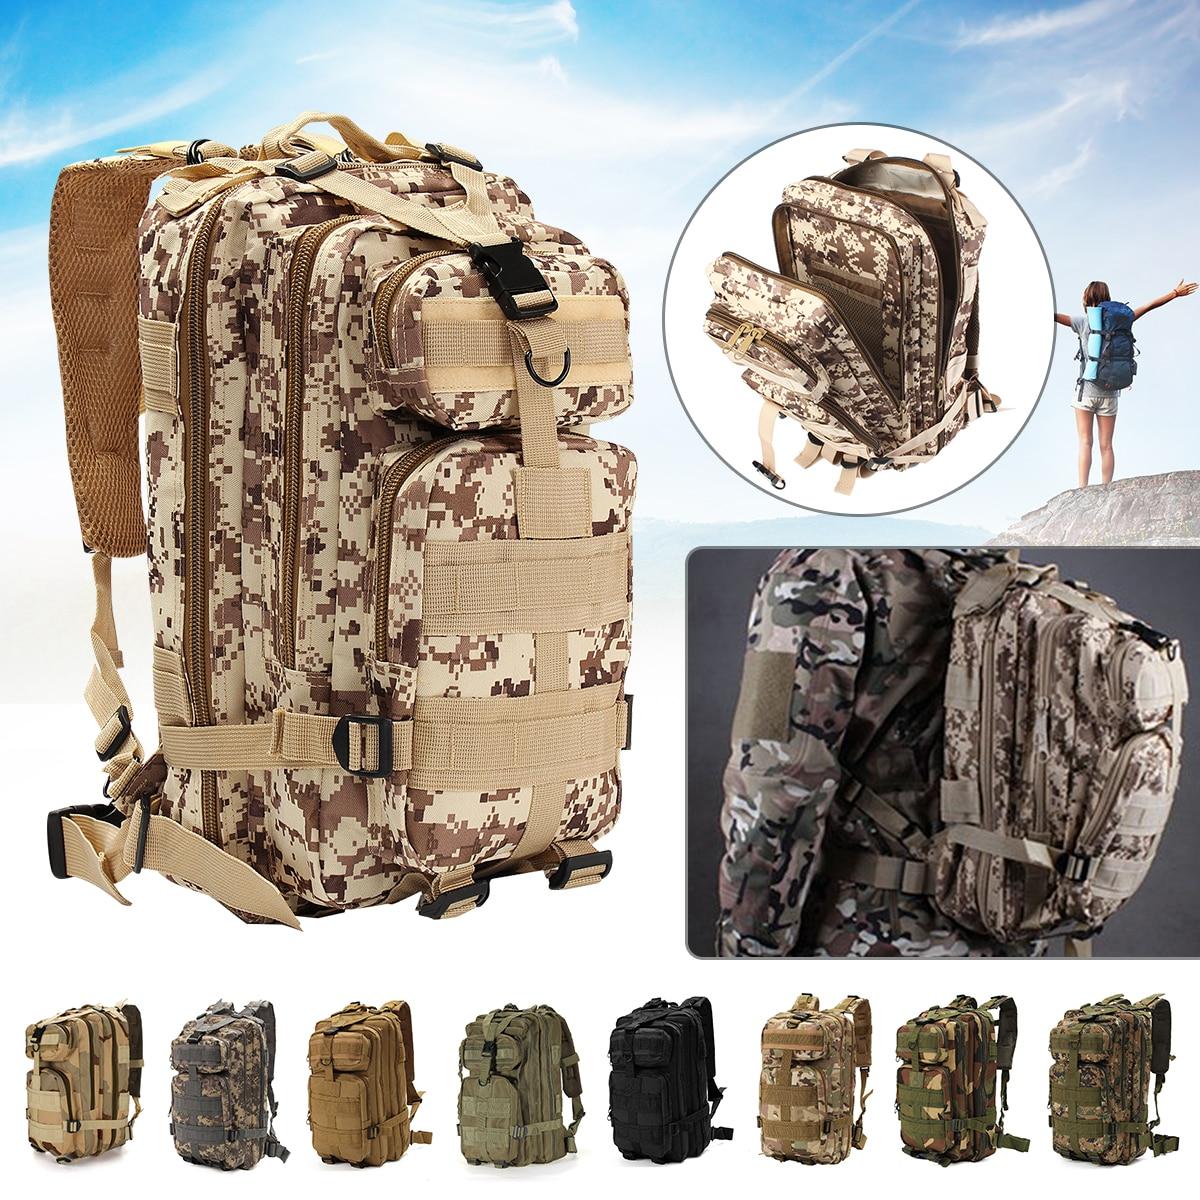 Mochila táctica militar mochila ajustable viaje Camping senderismo camuflaje bolsa para deportes al aire libre militar ejército mochila